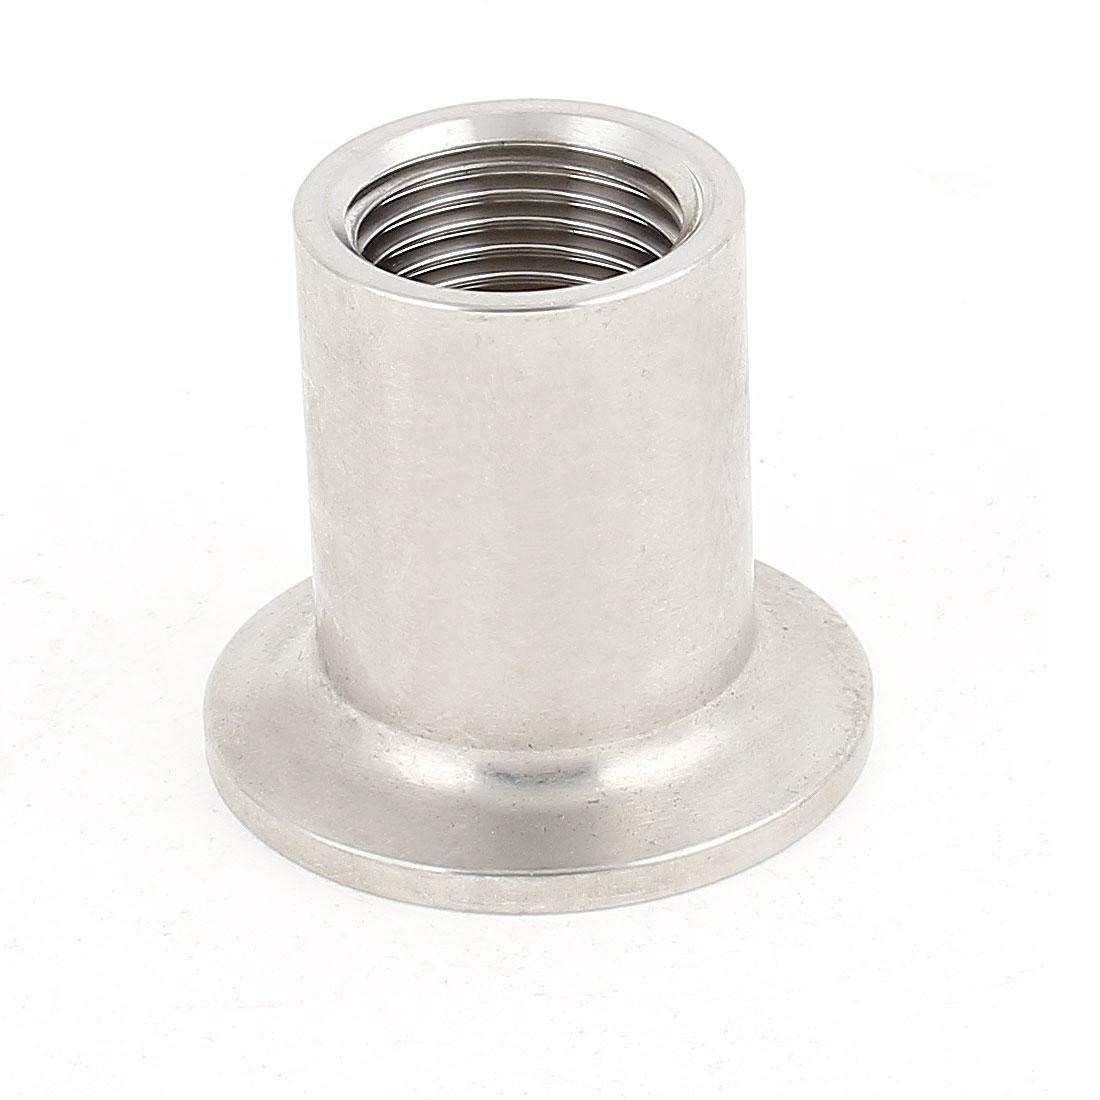 Stainless Steel 304 Vacuum KF25 Flange 1/2BSP Female Thread Adapter